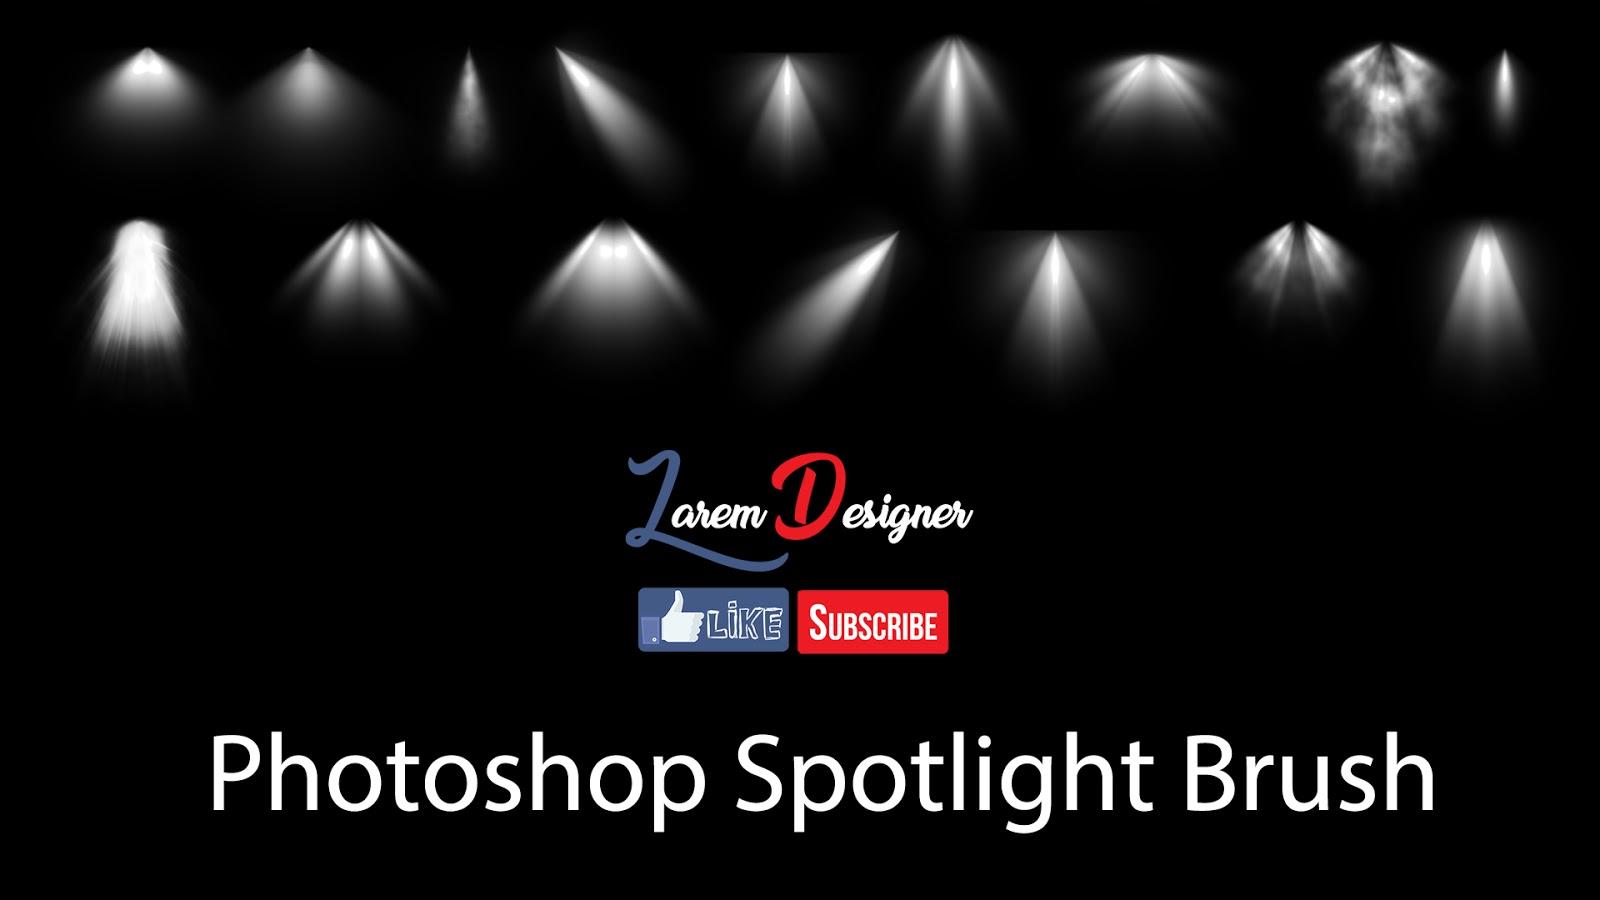 Spotlight PowerPoint Templates - Indezine